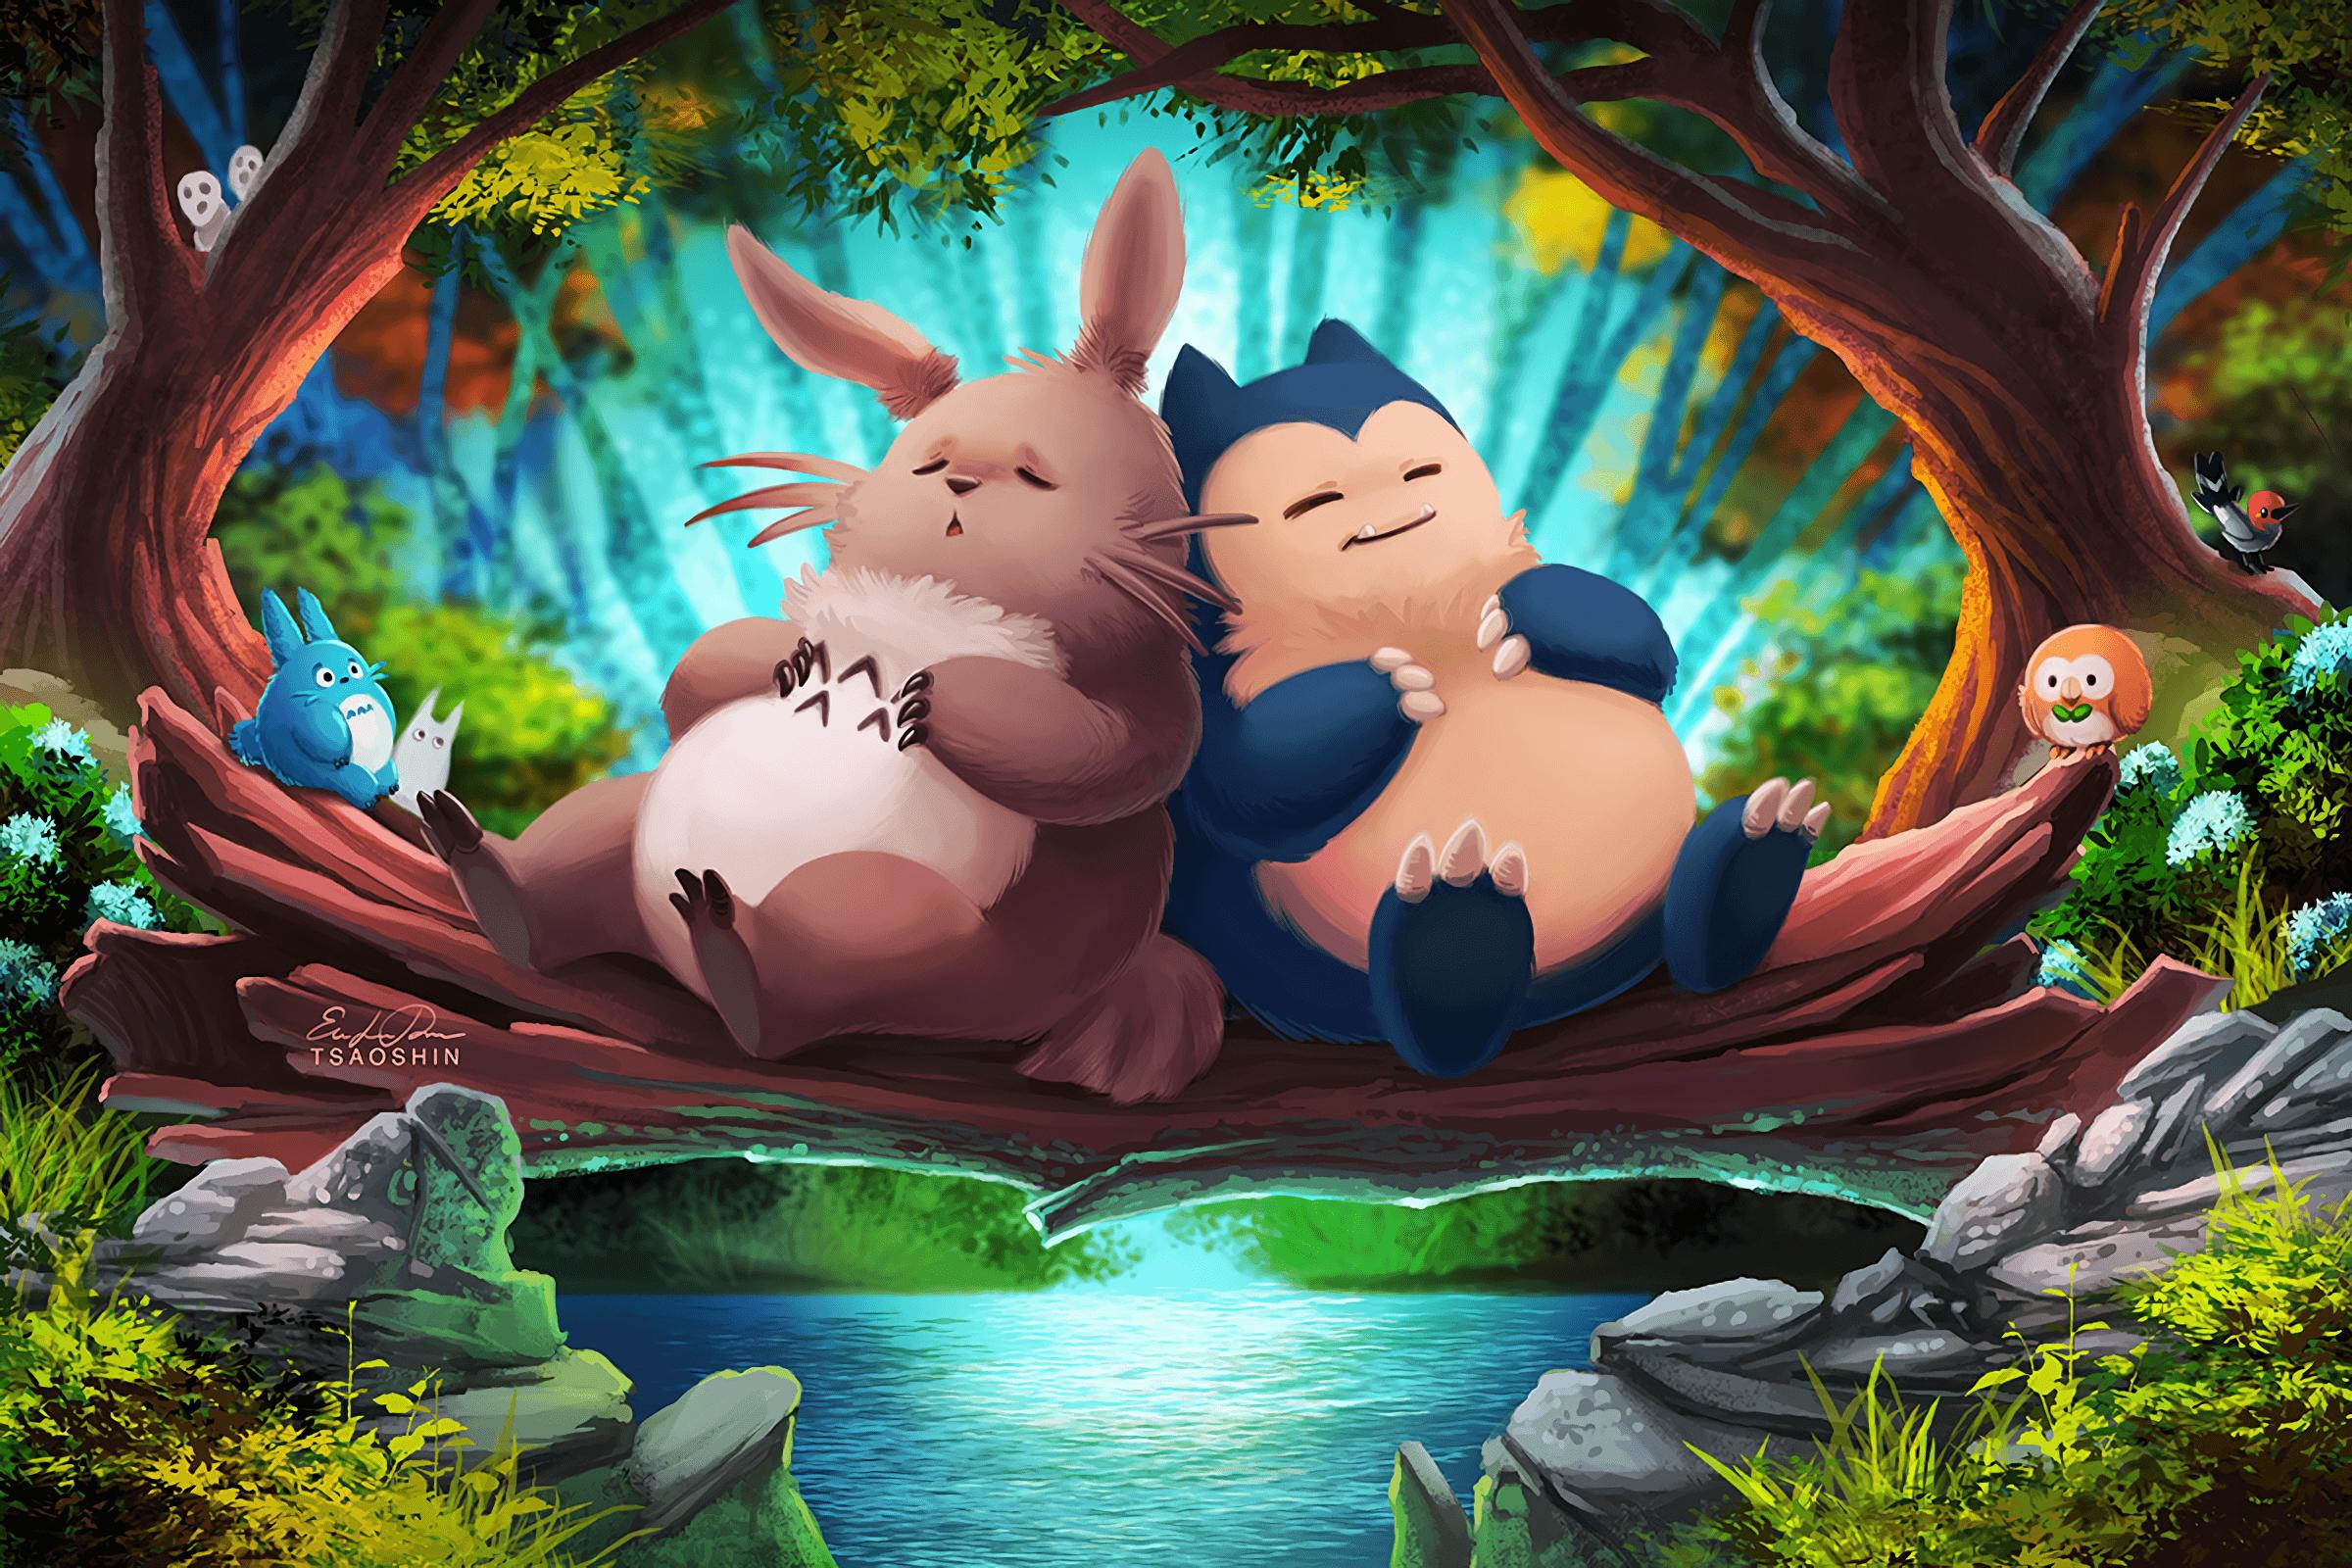 Totoro Pikachu Wallpapers - Top Free Totoro Pikachu ...